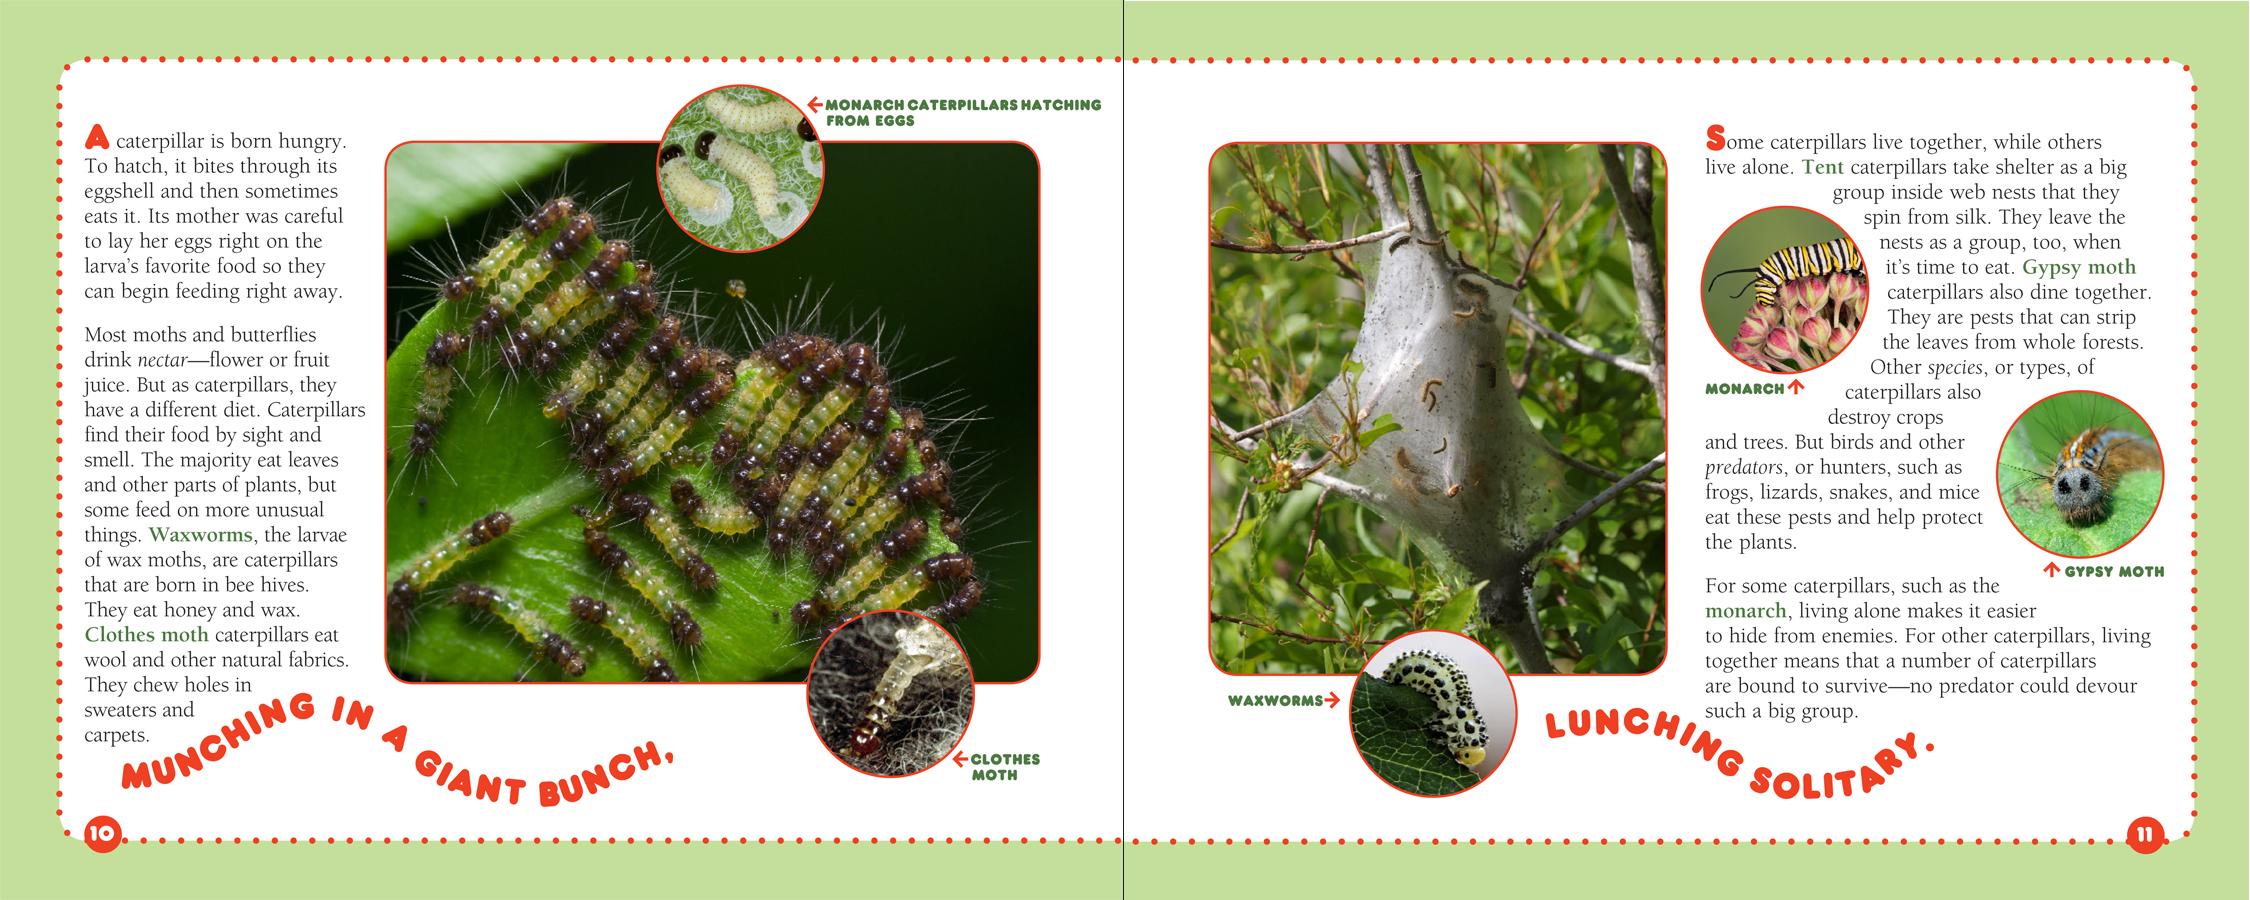 Caterpillars_5-6